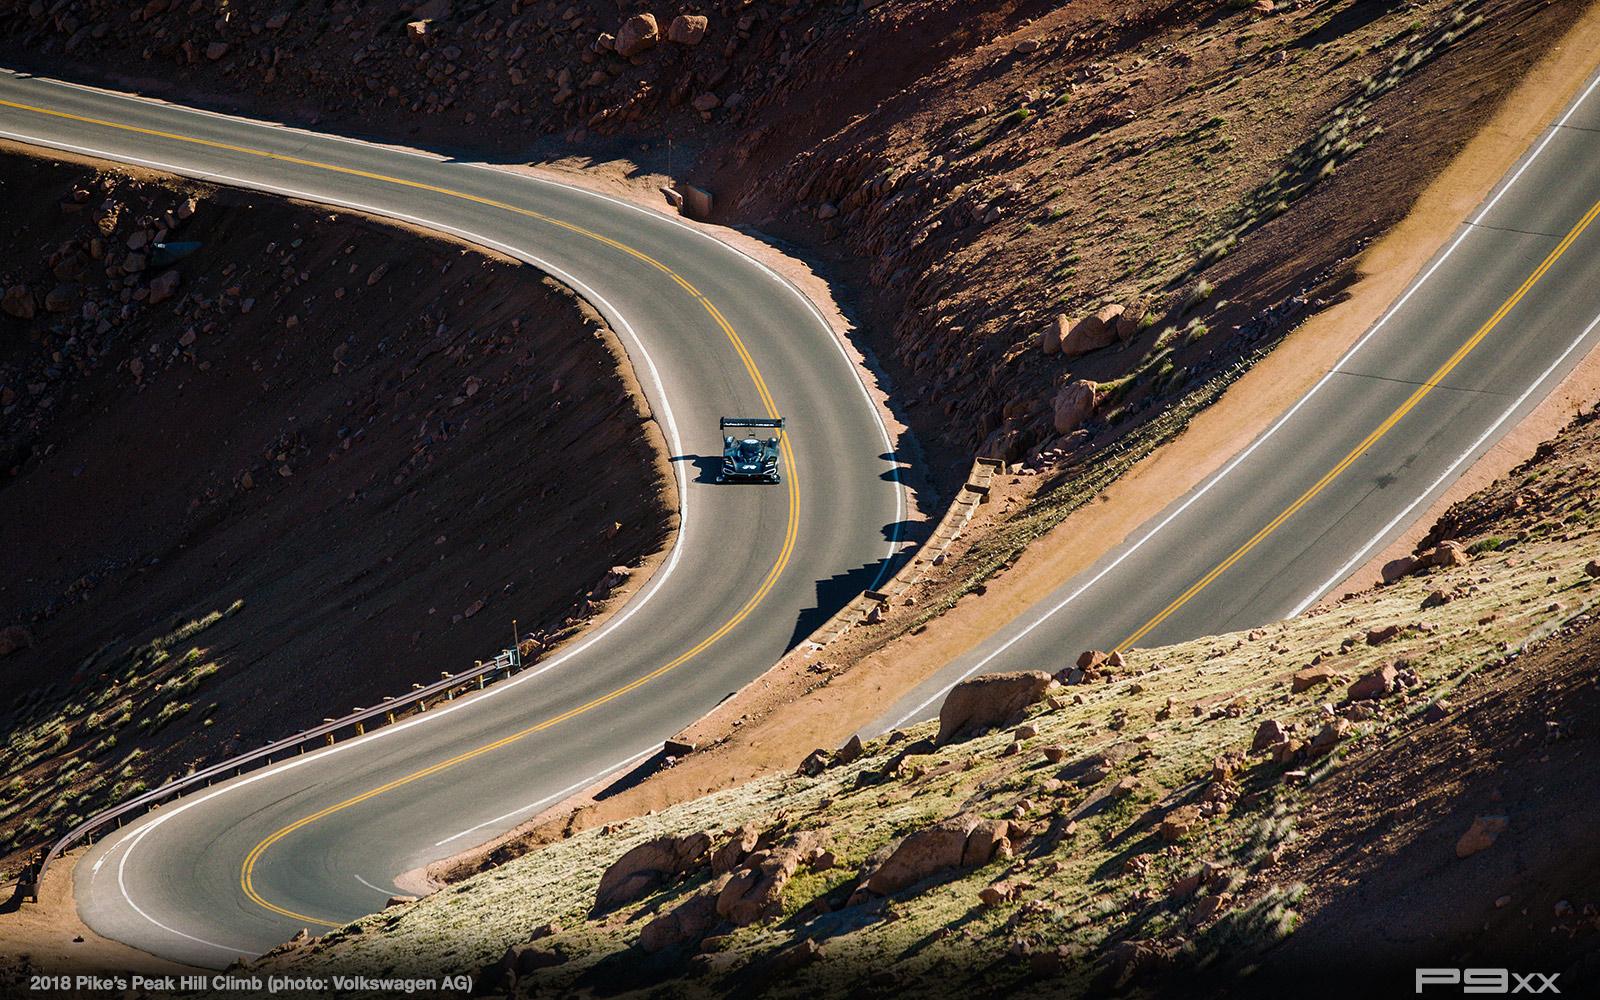 2018-Pikes-Peak-Volkswagen-IDR-302